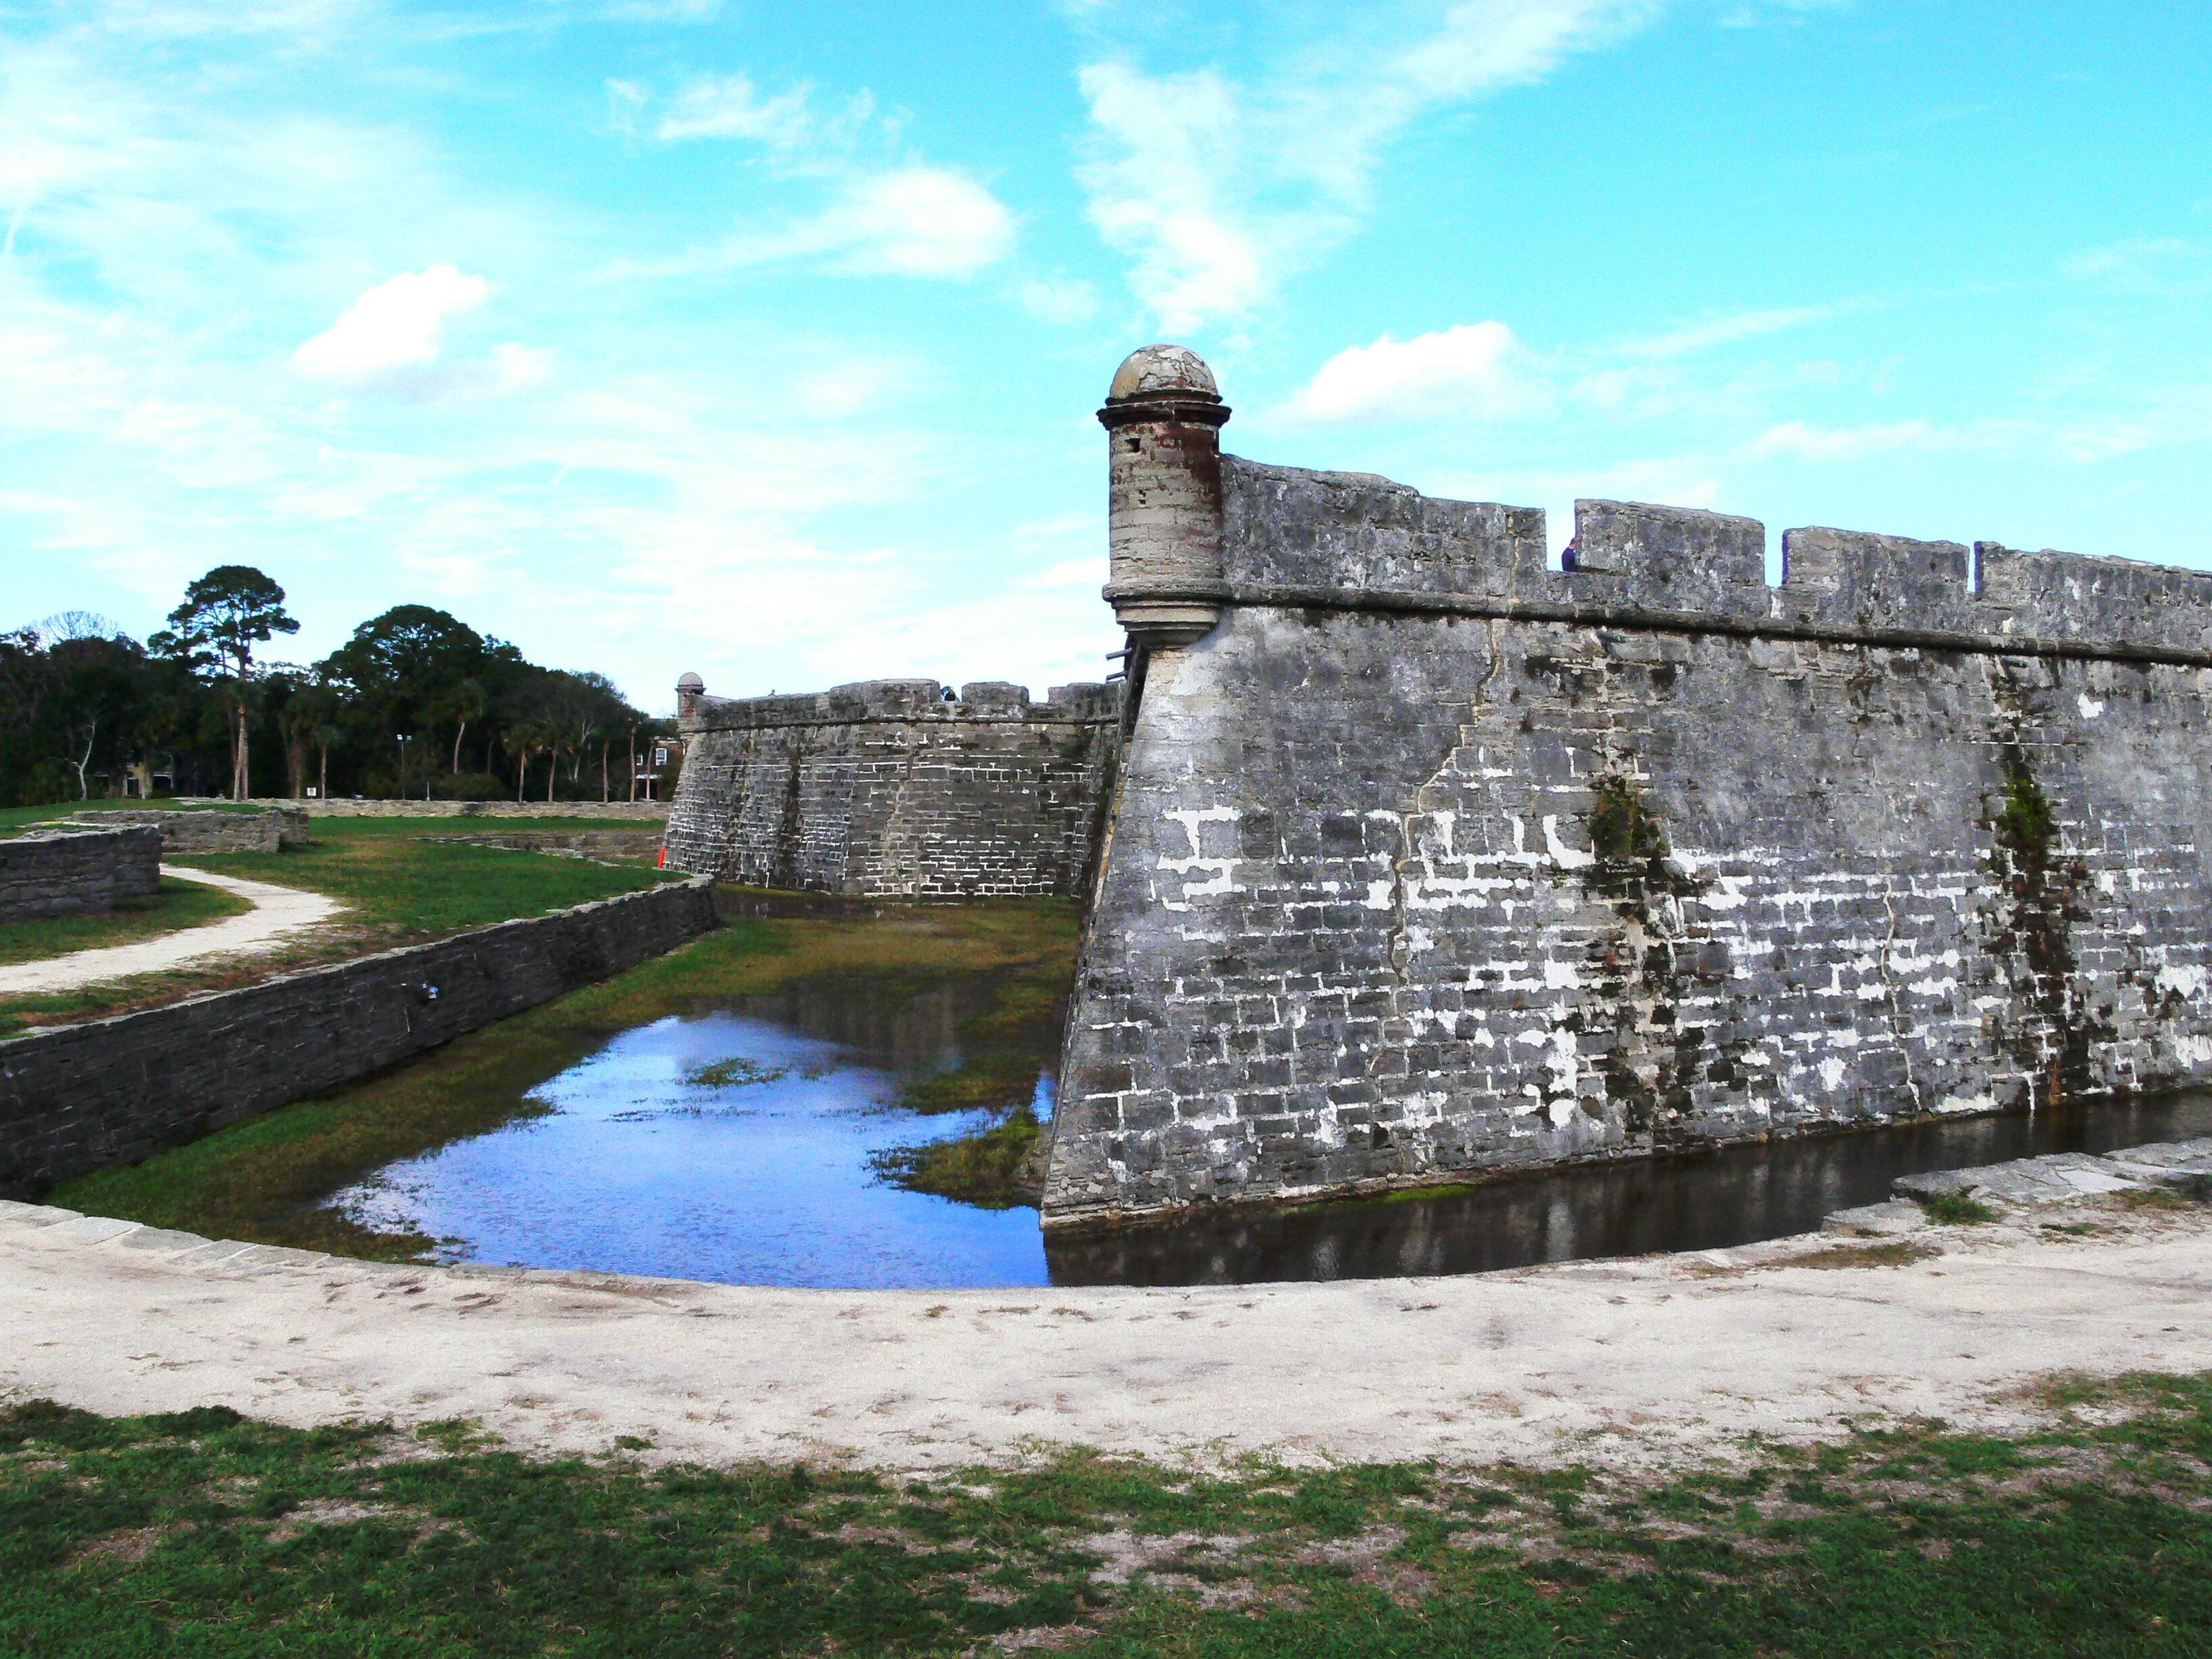 File:Castillo de San Marcos National Monument.JPG - Wikimedia Commons